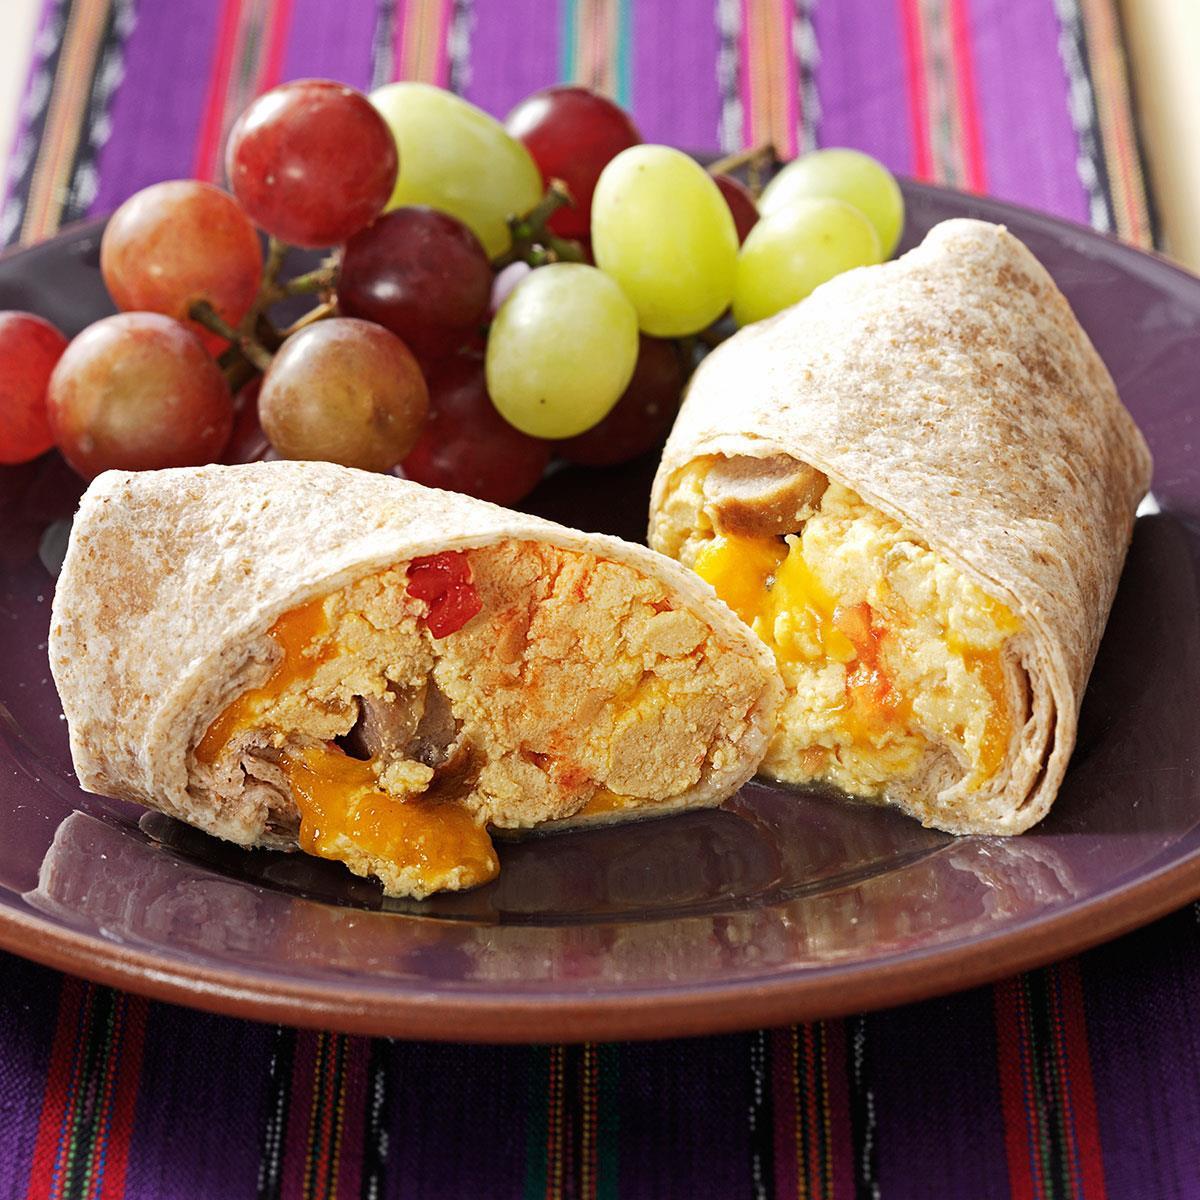 Sausage Breakfast Burrito Recipe  Sausage & Salsa Breakfast Burritos Recipe